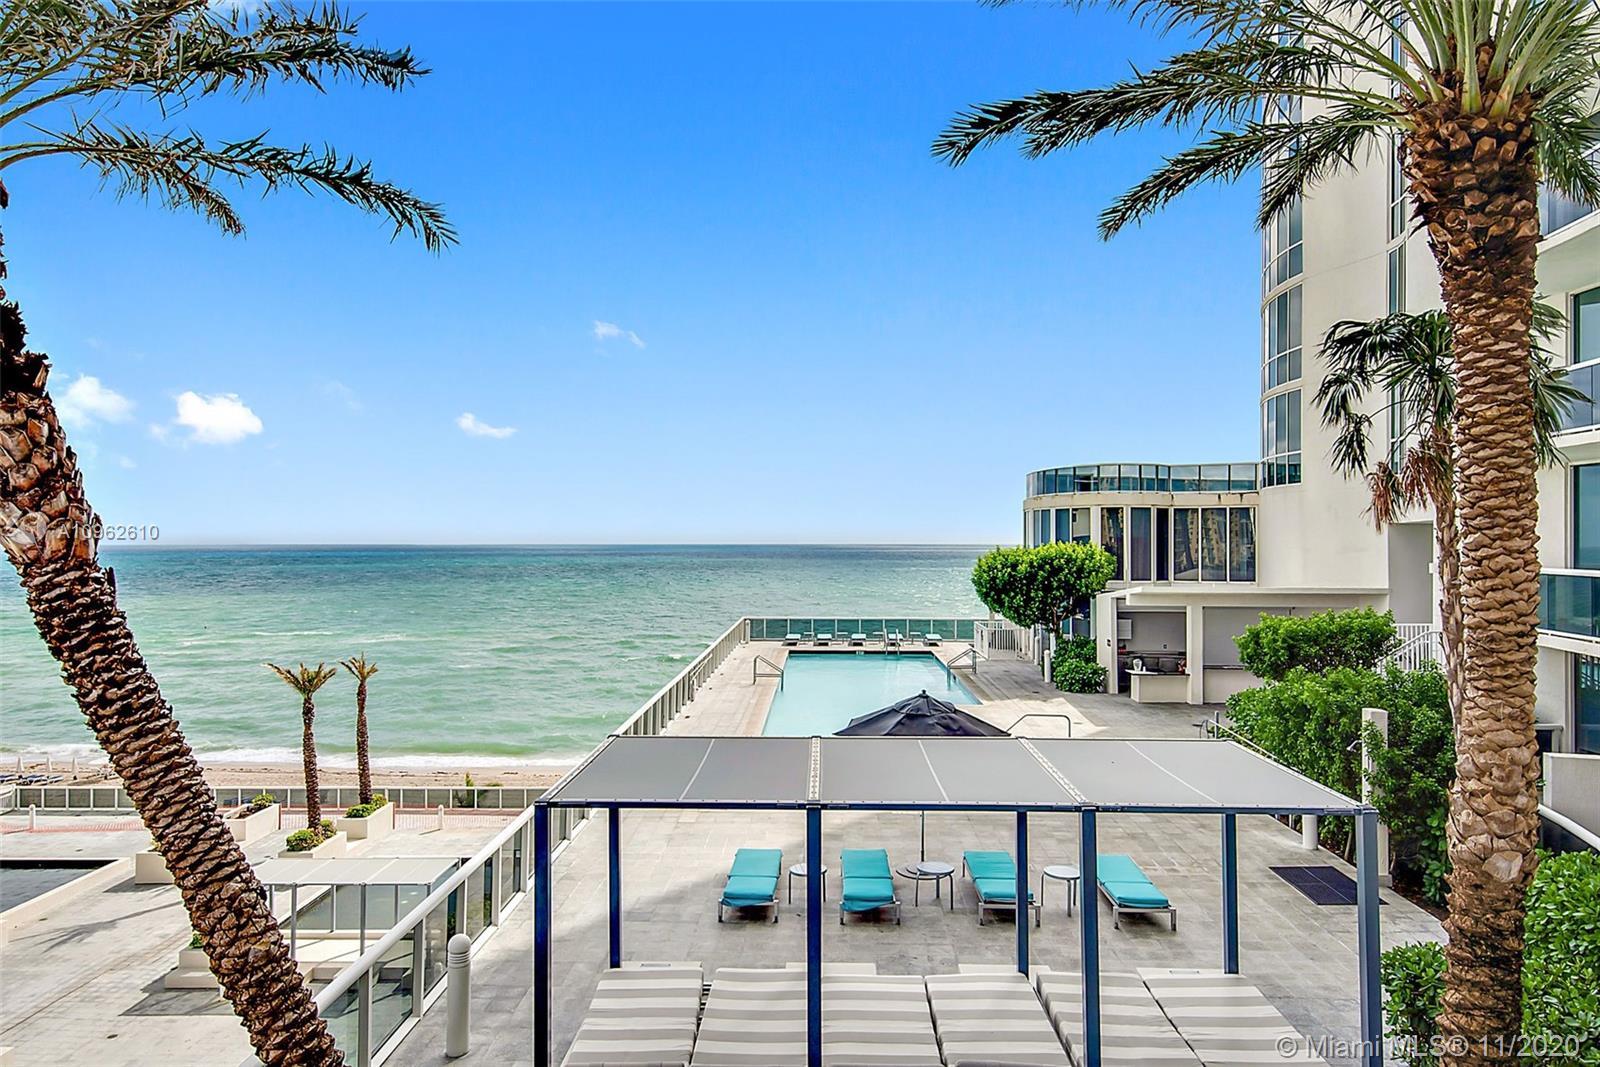 15811 Collins Ave Unit 504, Sunny Isles Beach, Florida 33160